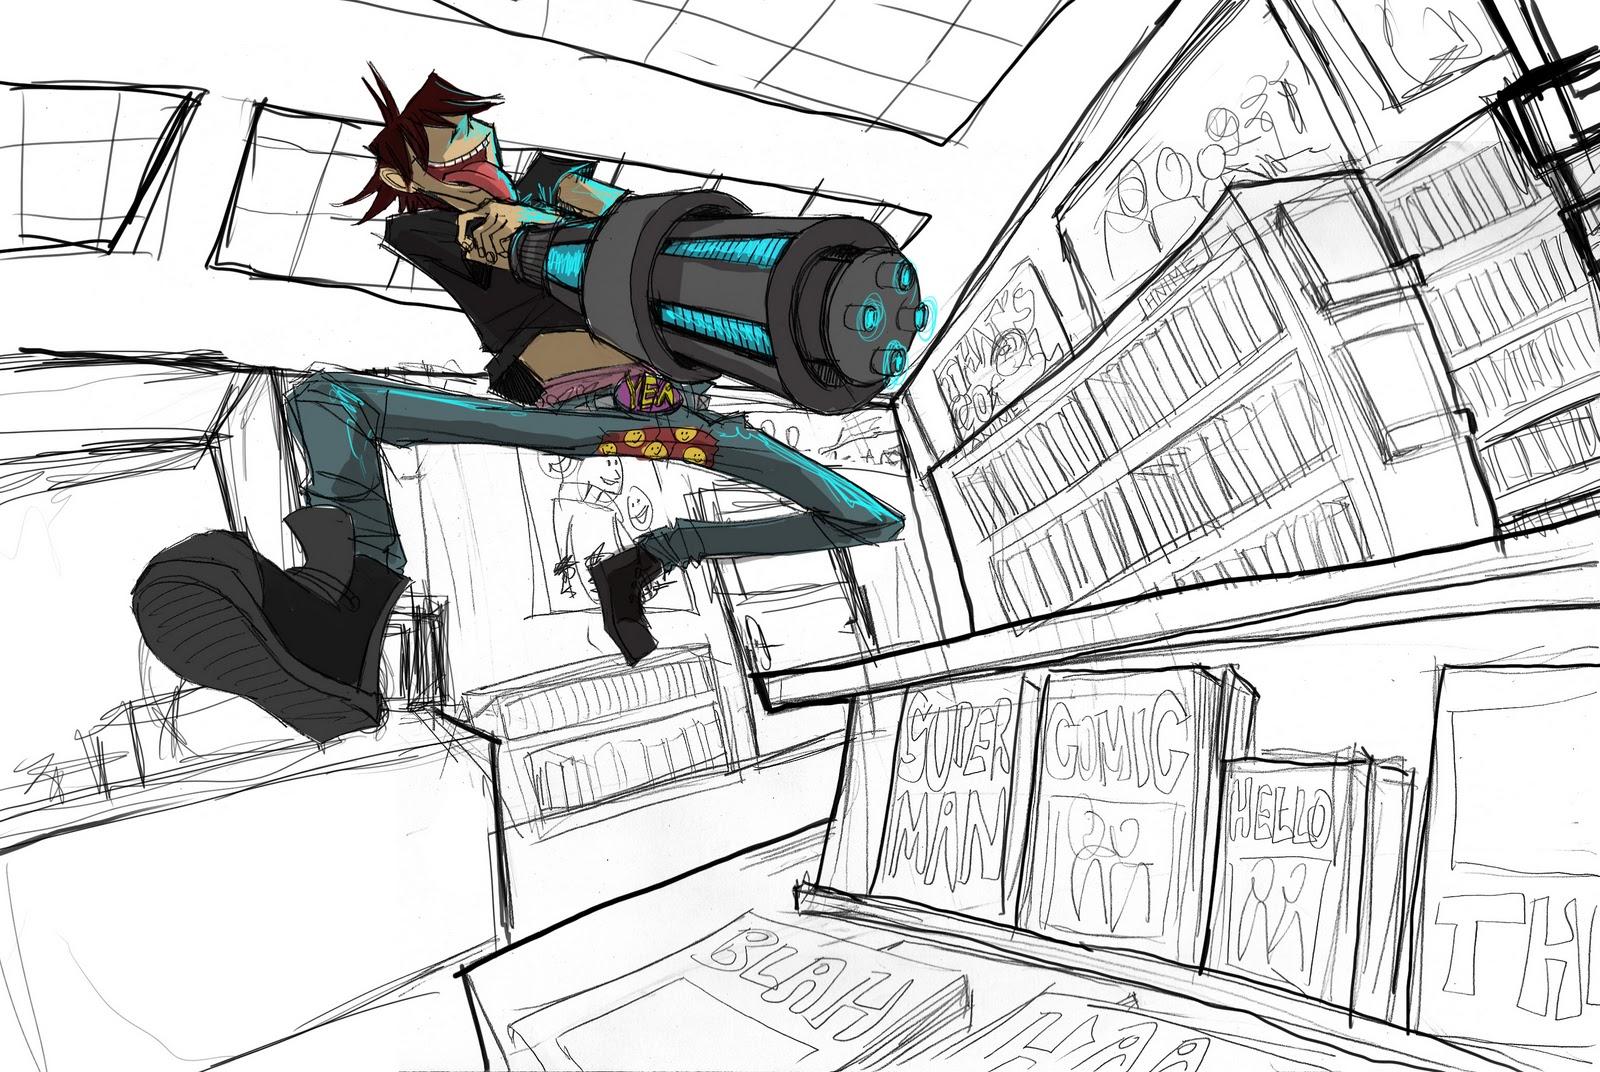 Diana Ling's Animation Thesis Blog: layout/visdev/workbook/I